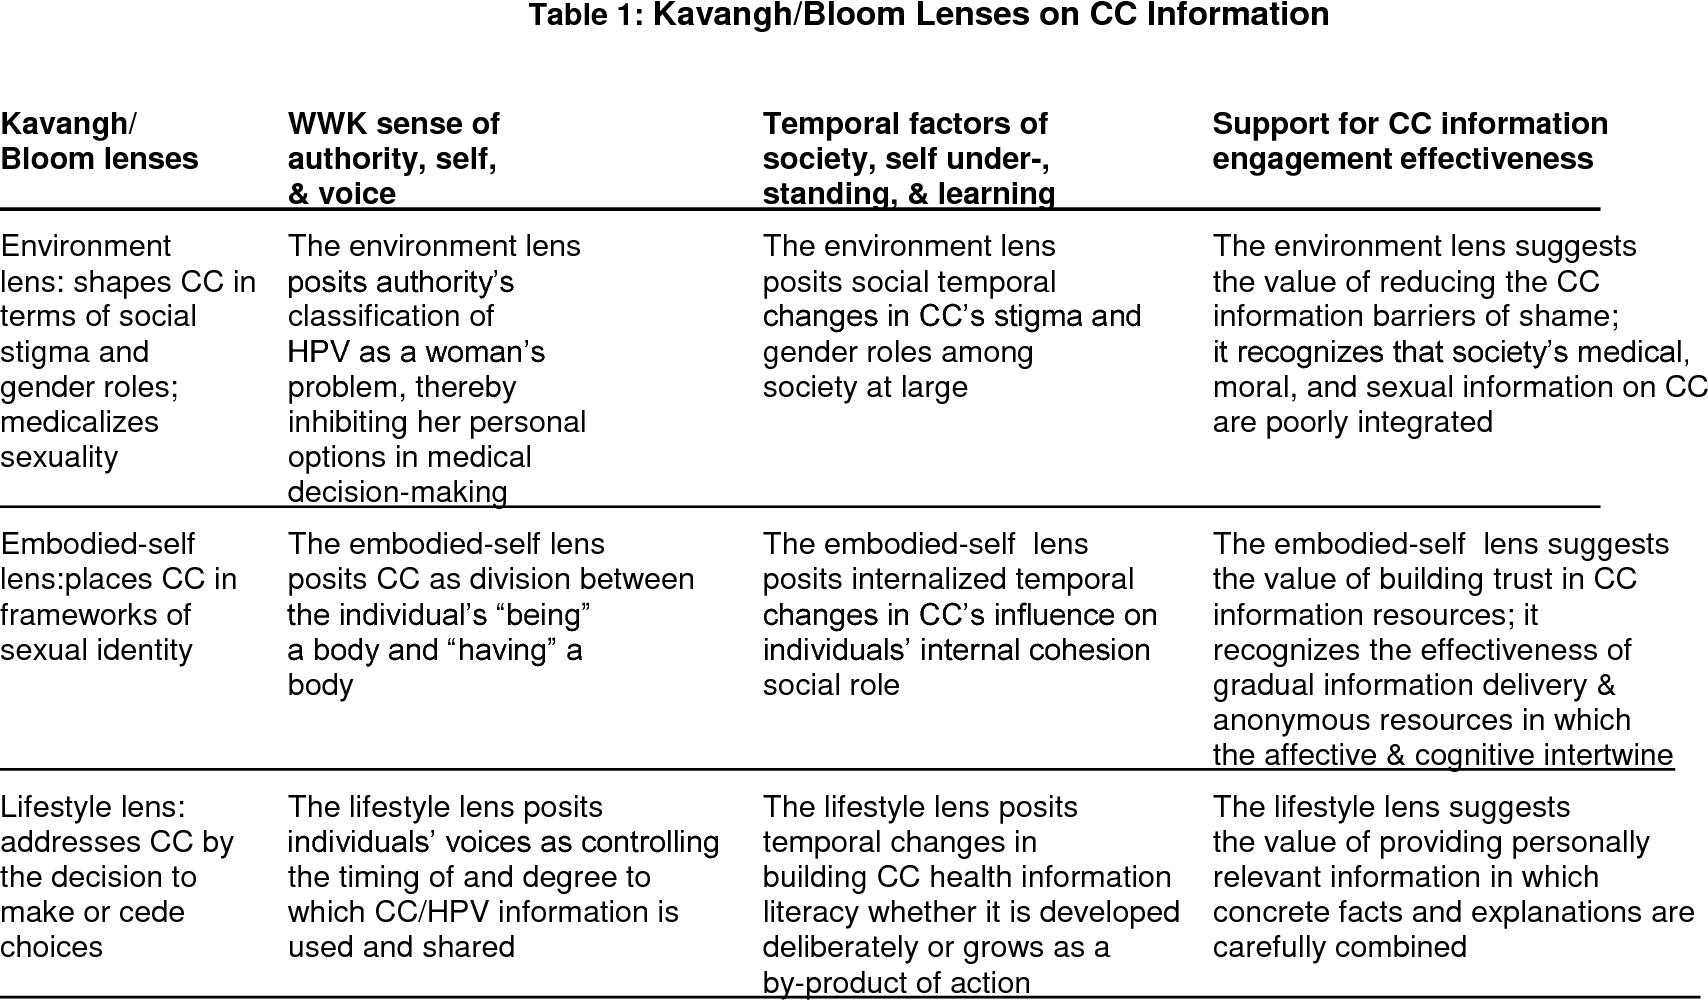 Table 1: Kavangh/Bloom Lenses on CC Information